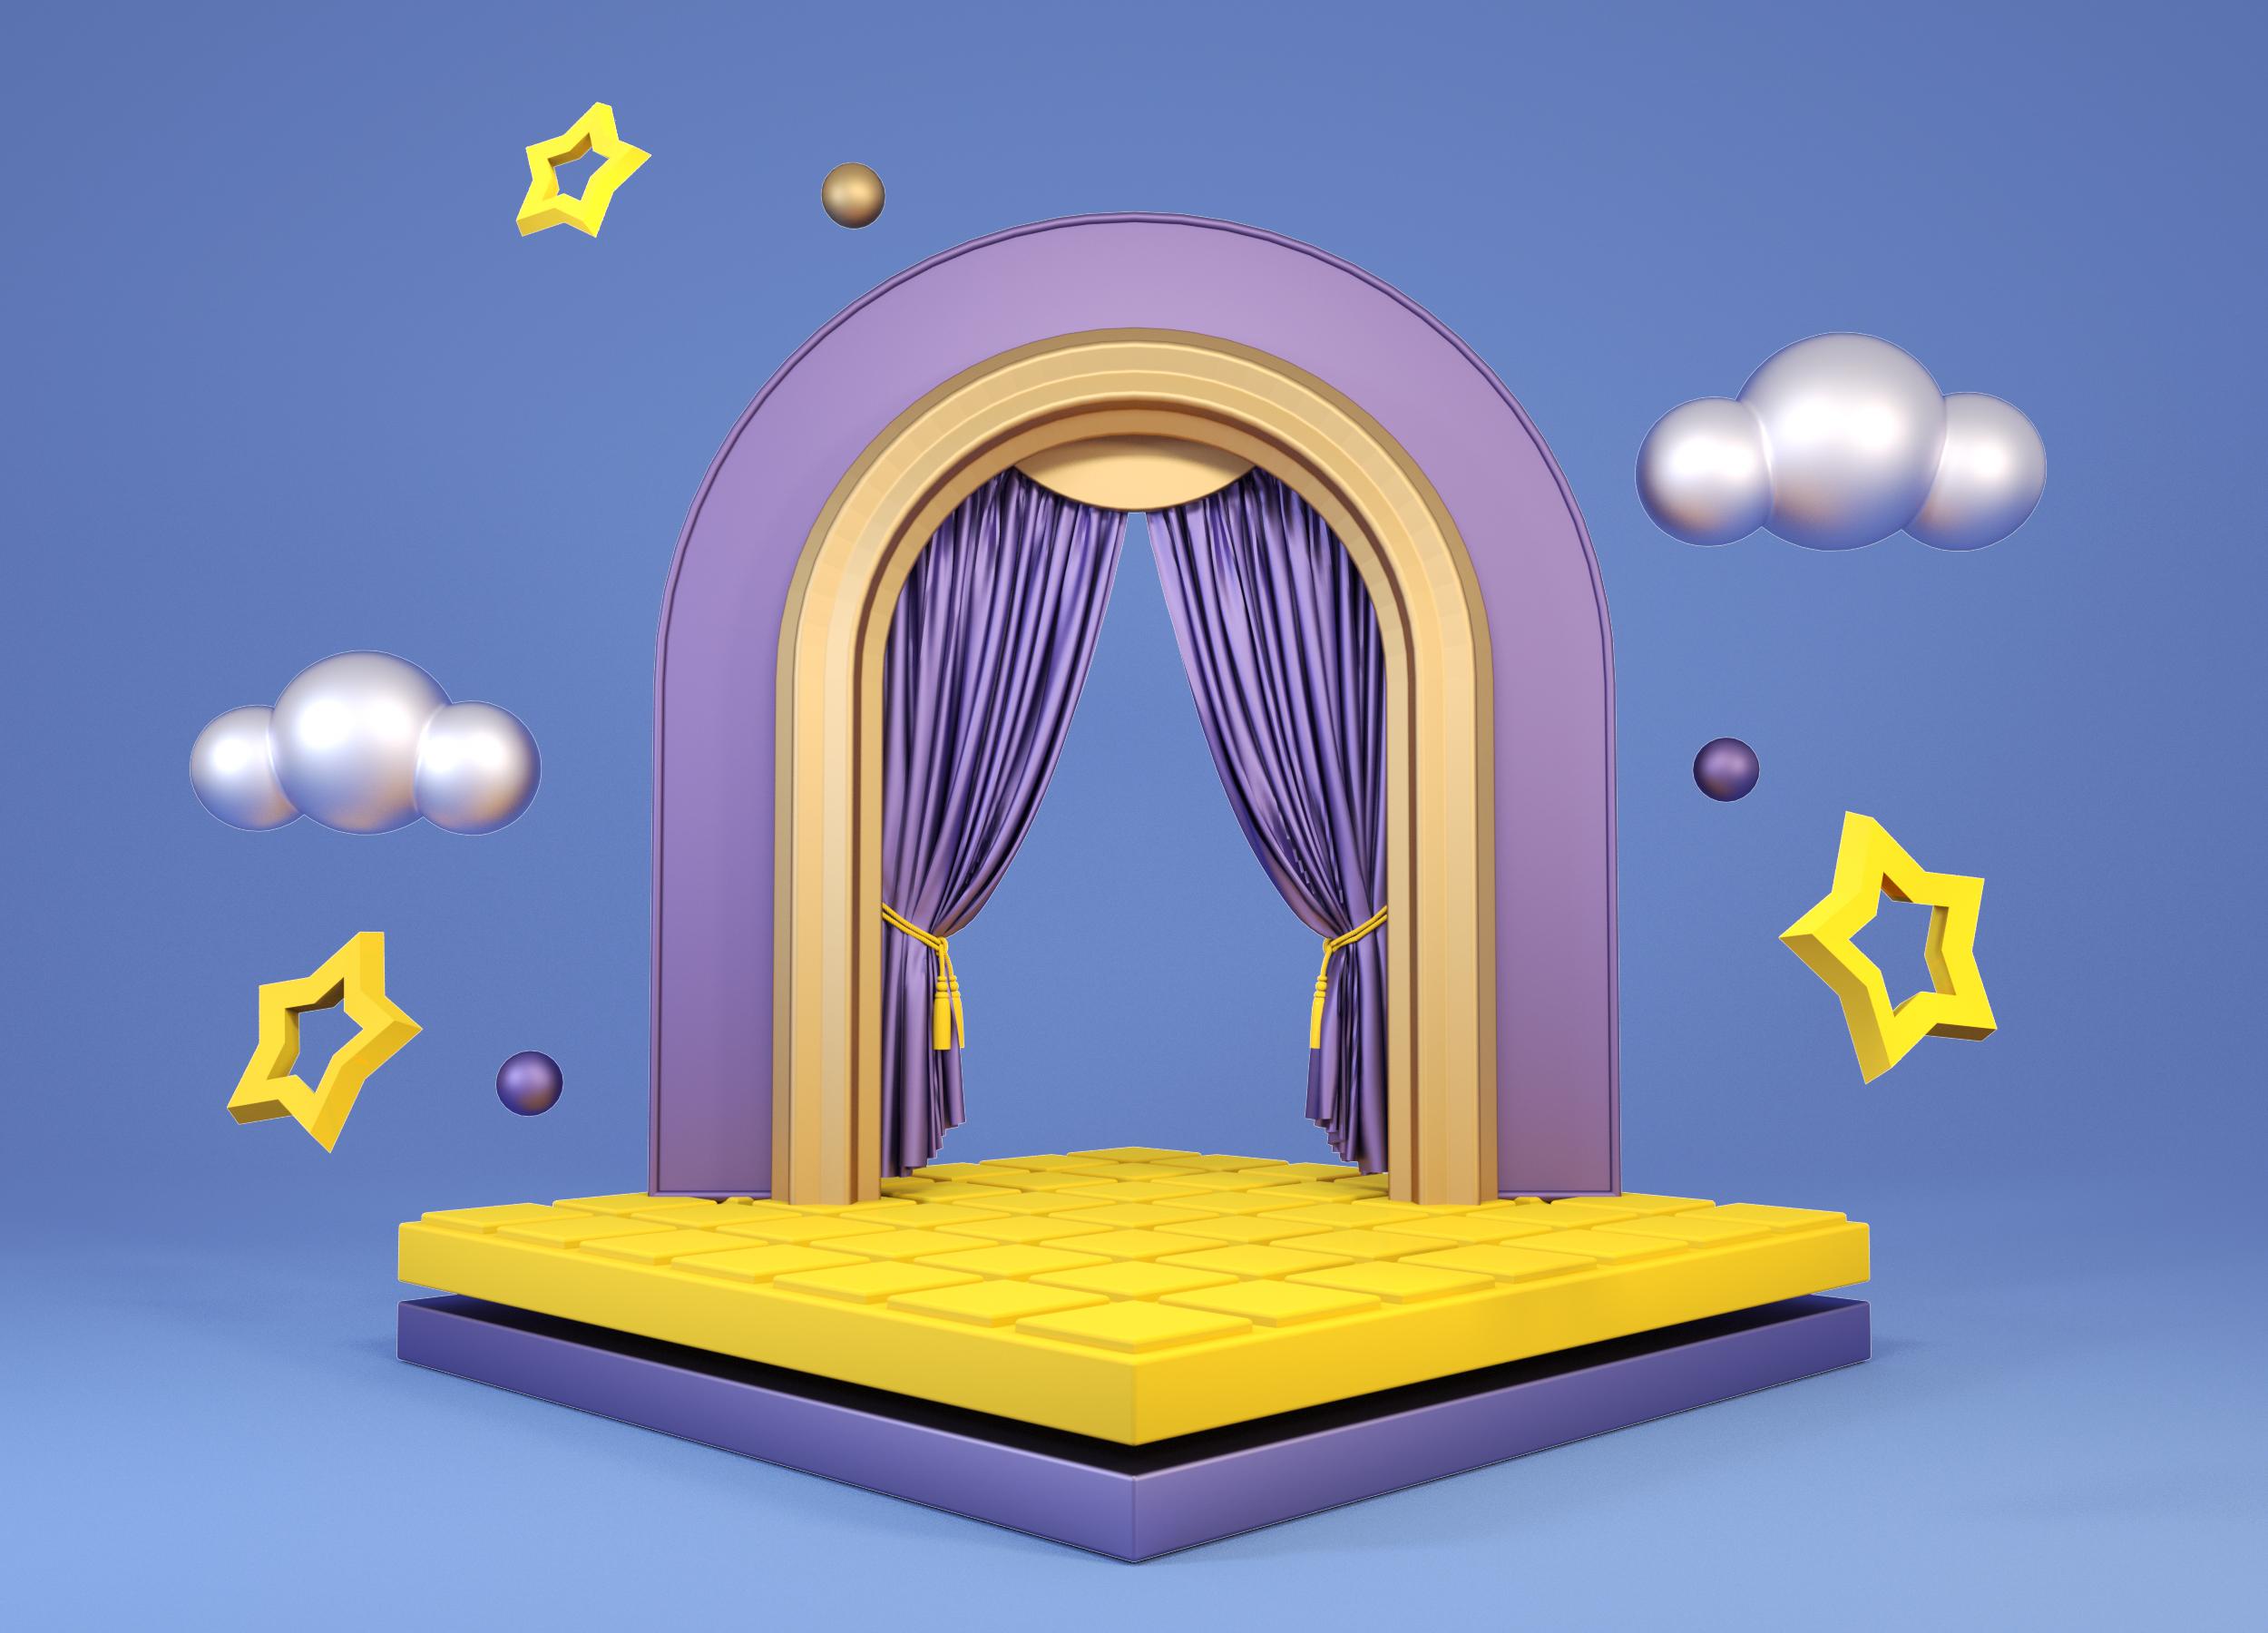 C4D装饰元素炫彩促销活动展台3d空间C4D装饰元素炫彩促销活动展台3d空间.jpg